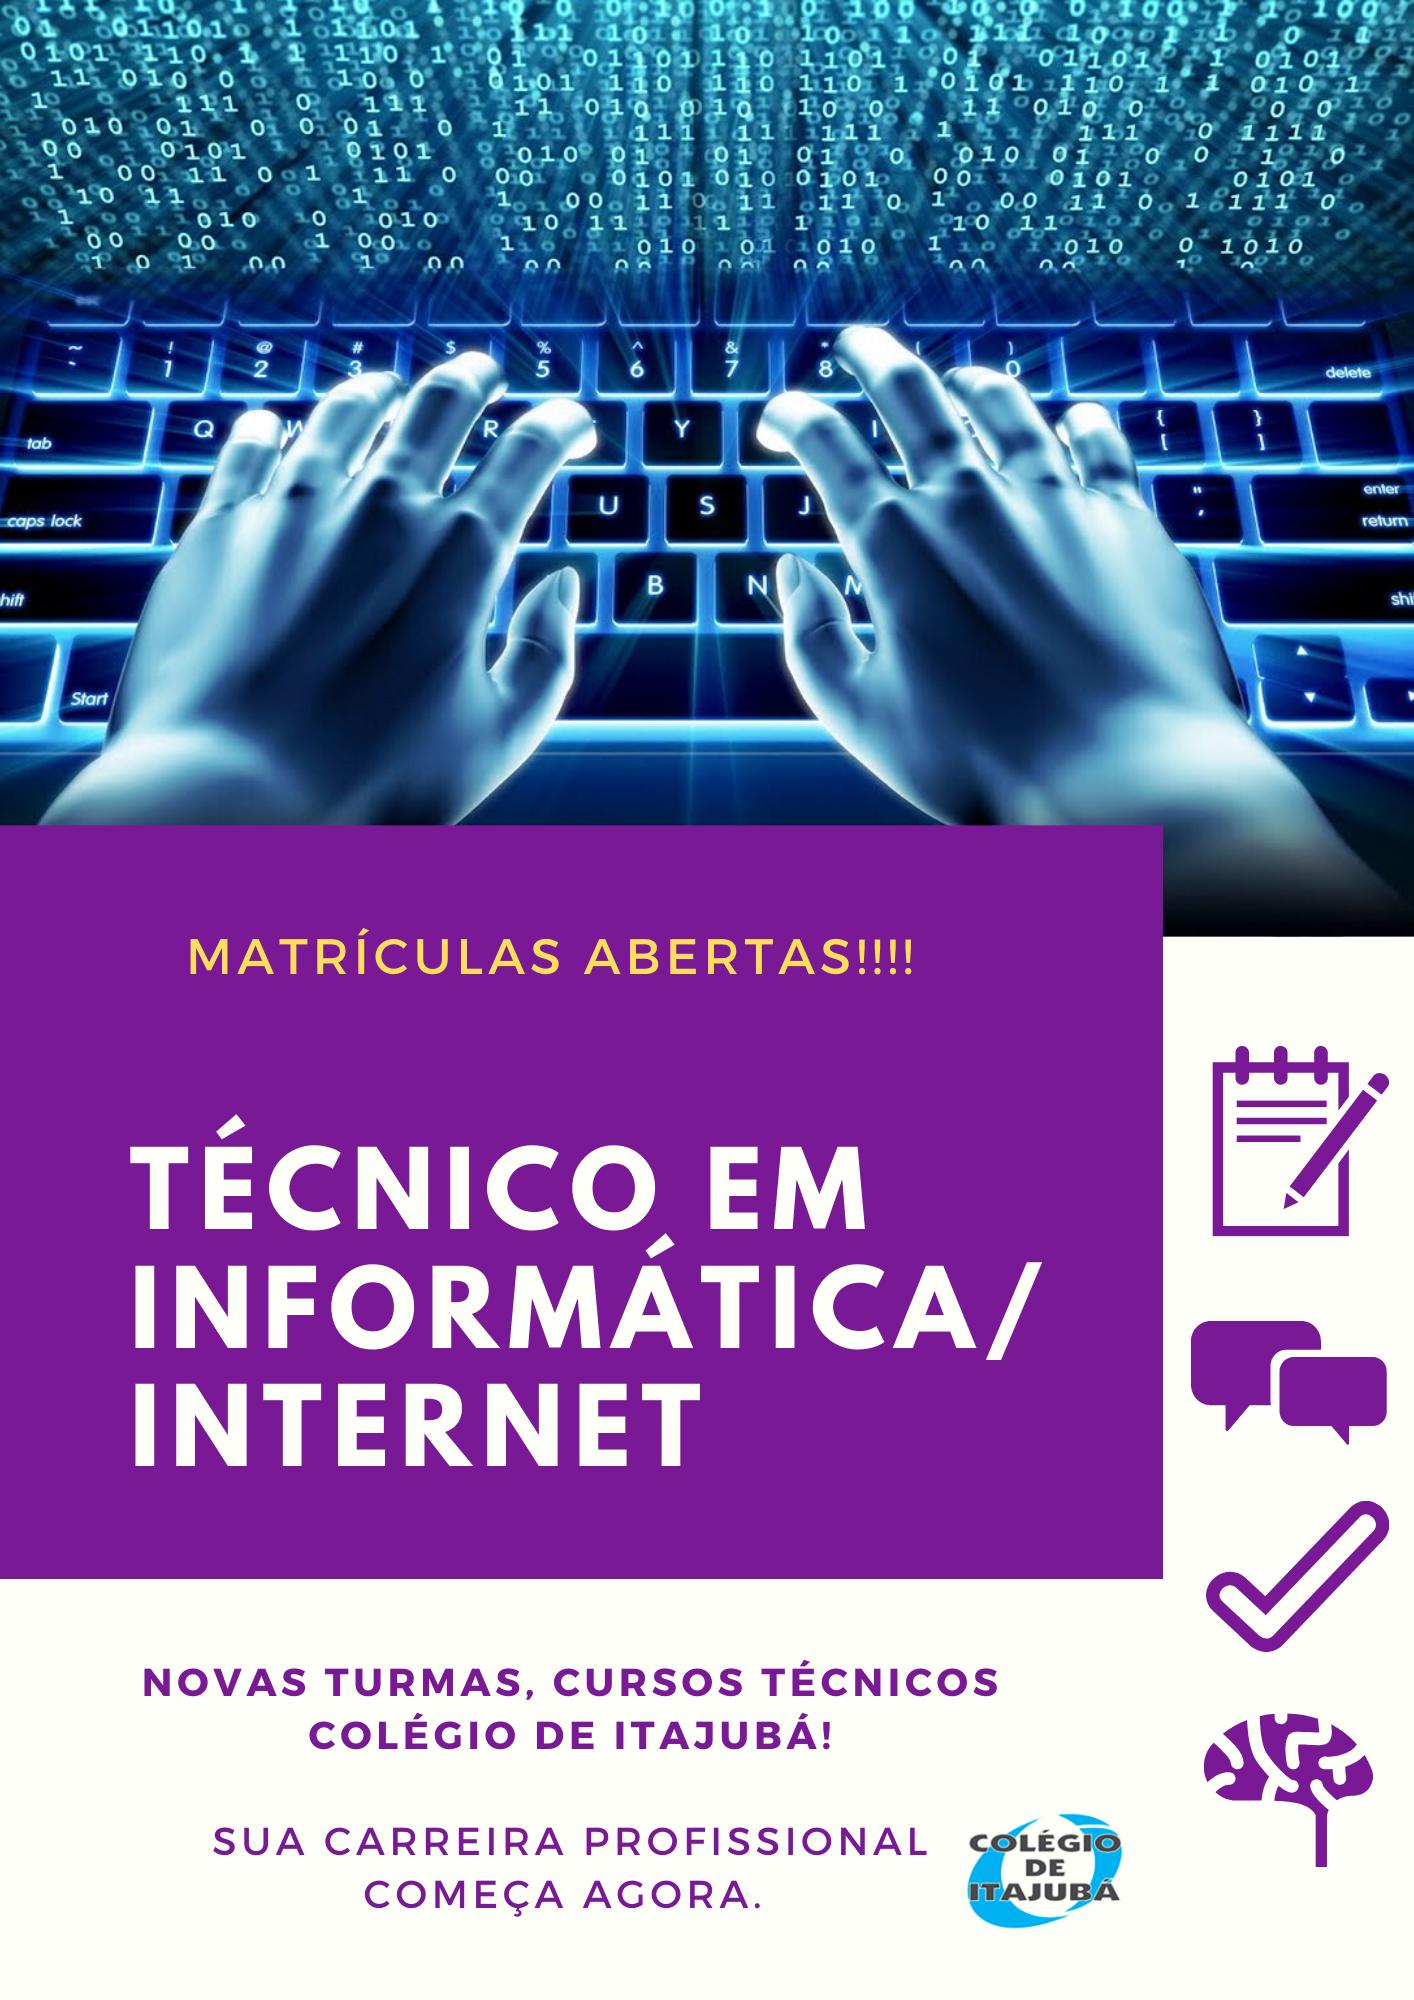 INFORMÁTICA/INTERNET!